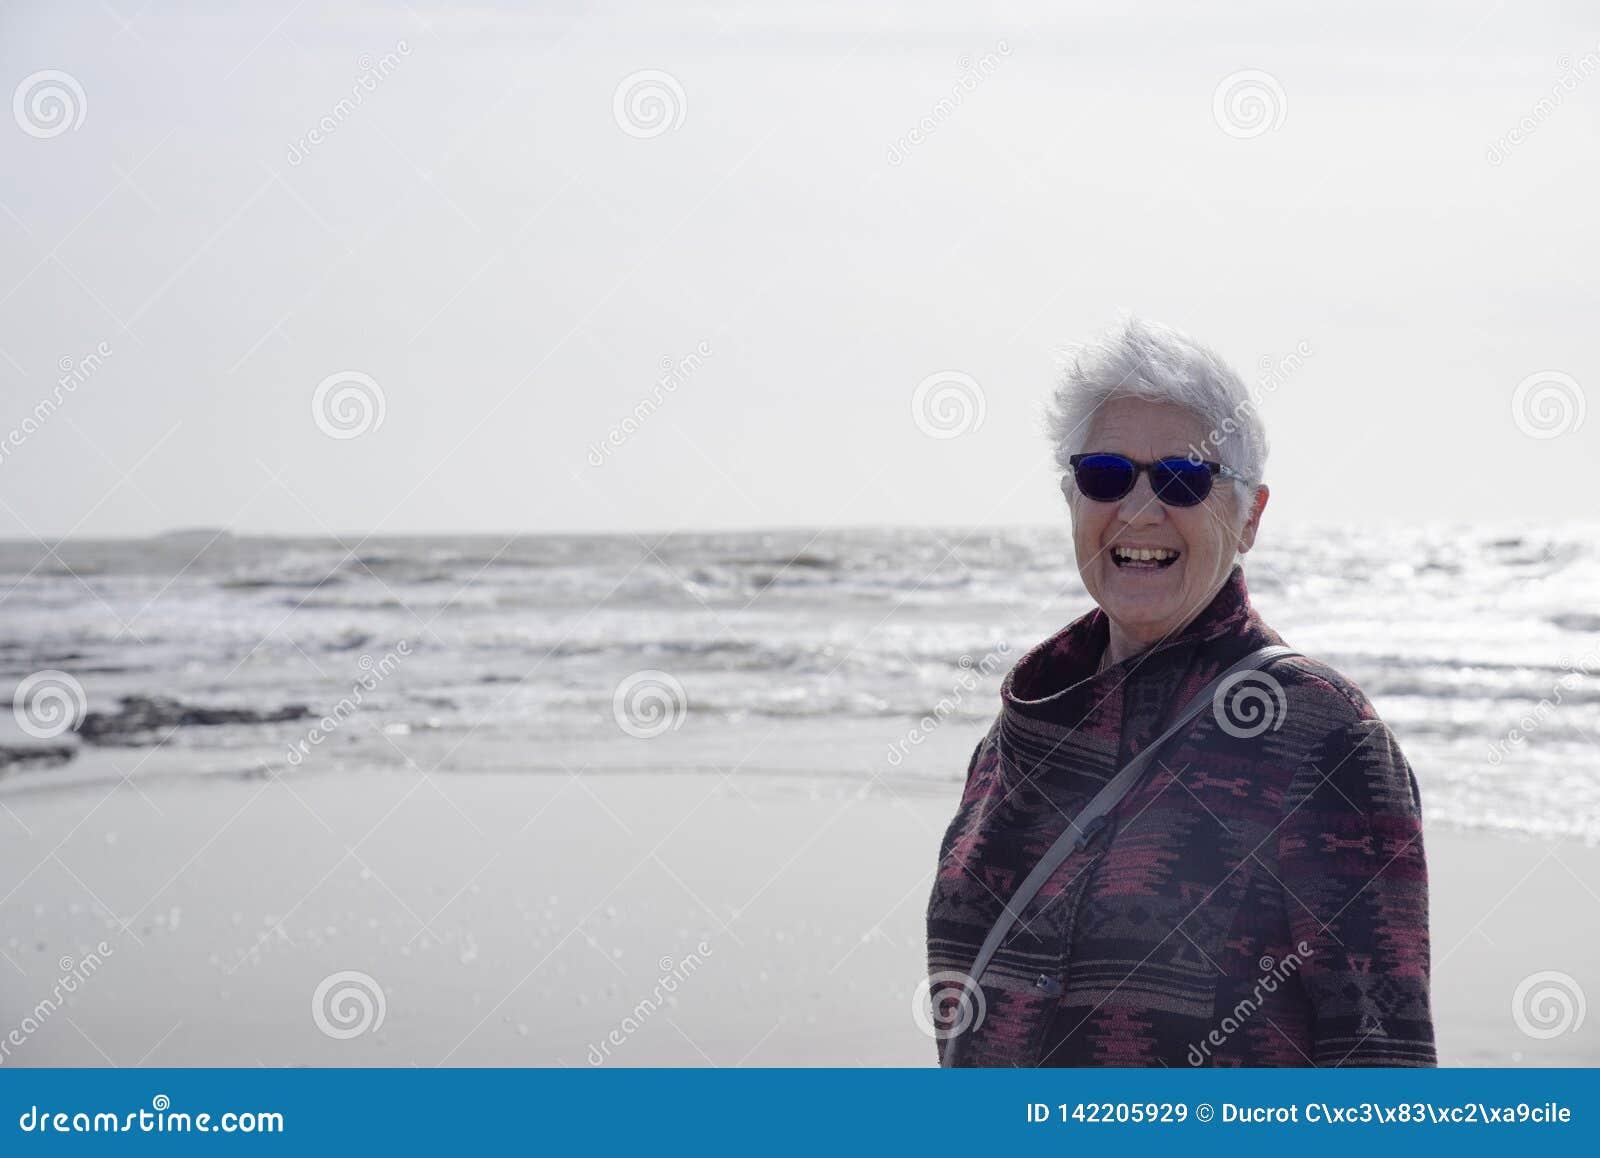 Portret starsza osoba